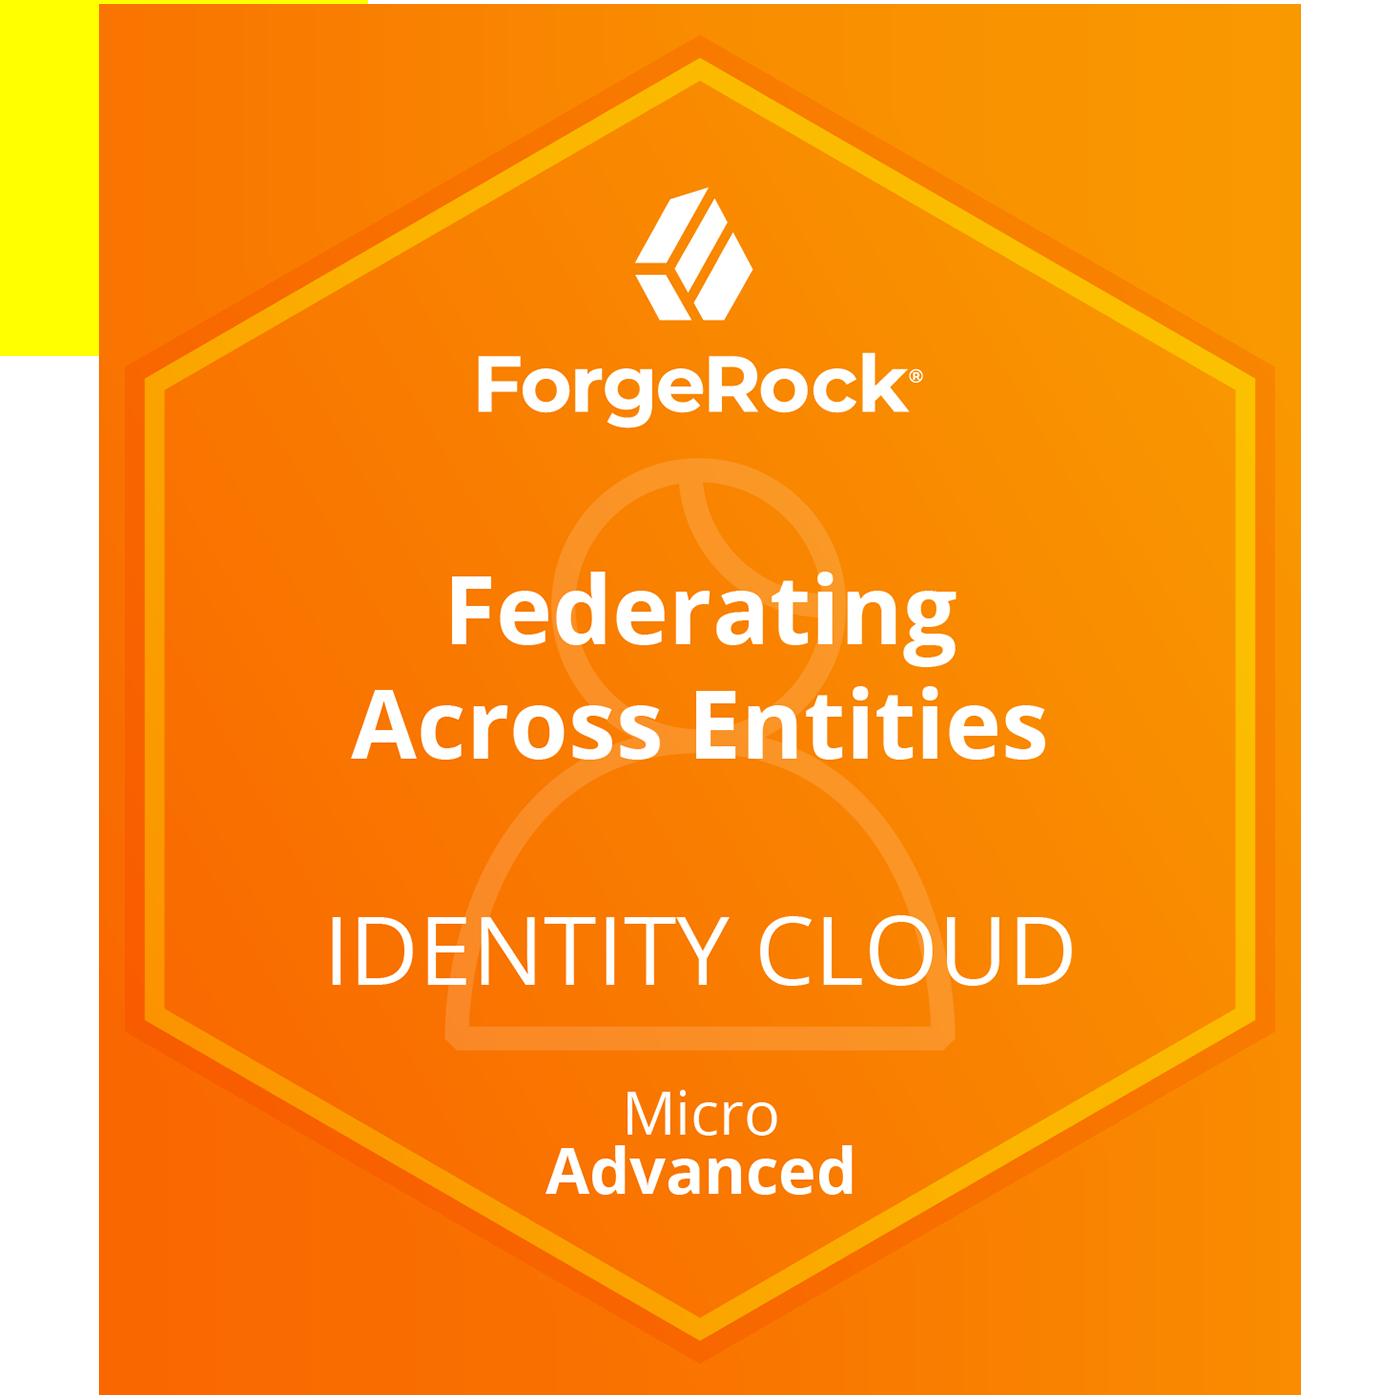 ForgeRock Identity Cloud: Access Management Micro Advanced Skills - Federating Across Entities Using SAML2